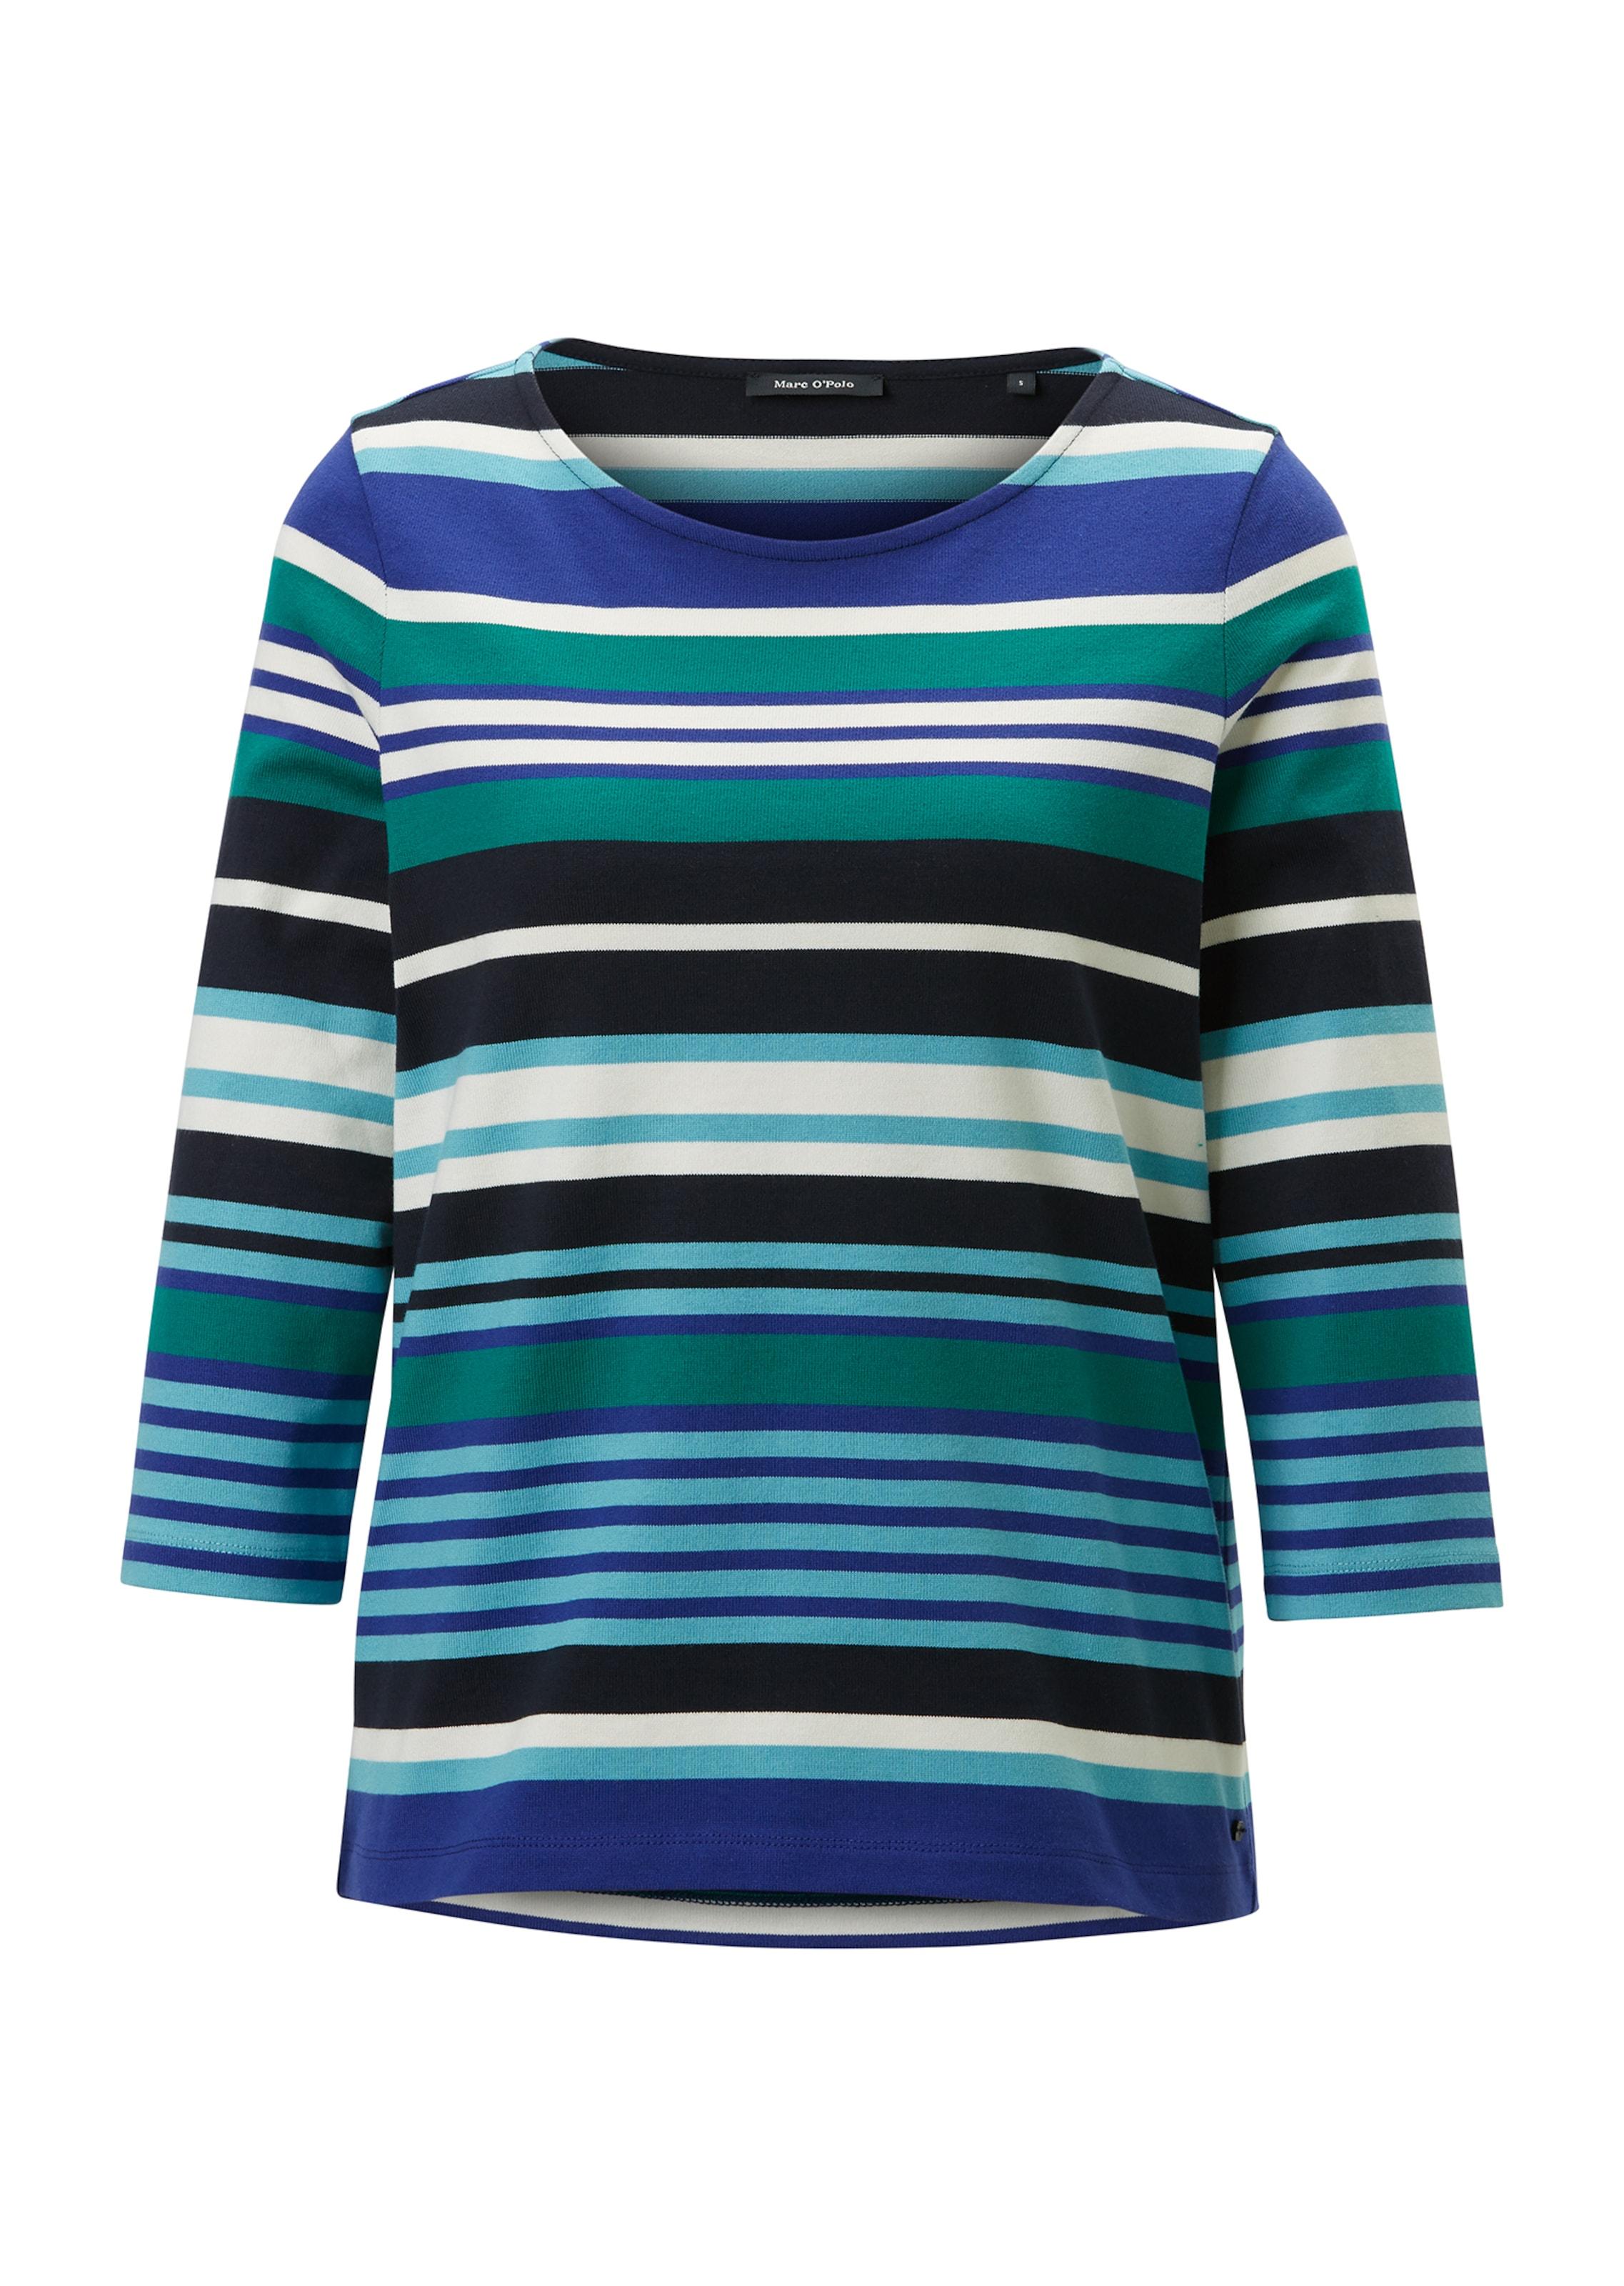 O'polo T shirt Mischfarben Marc In k8nwX0OP